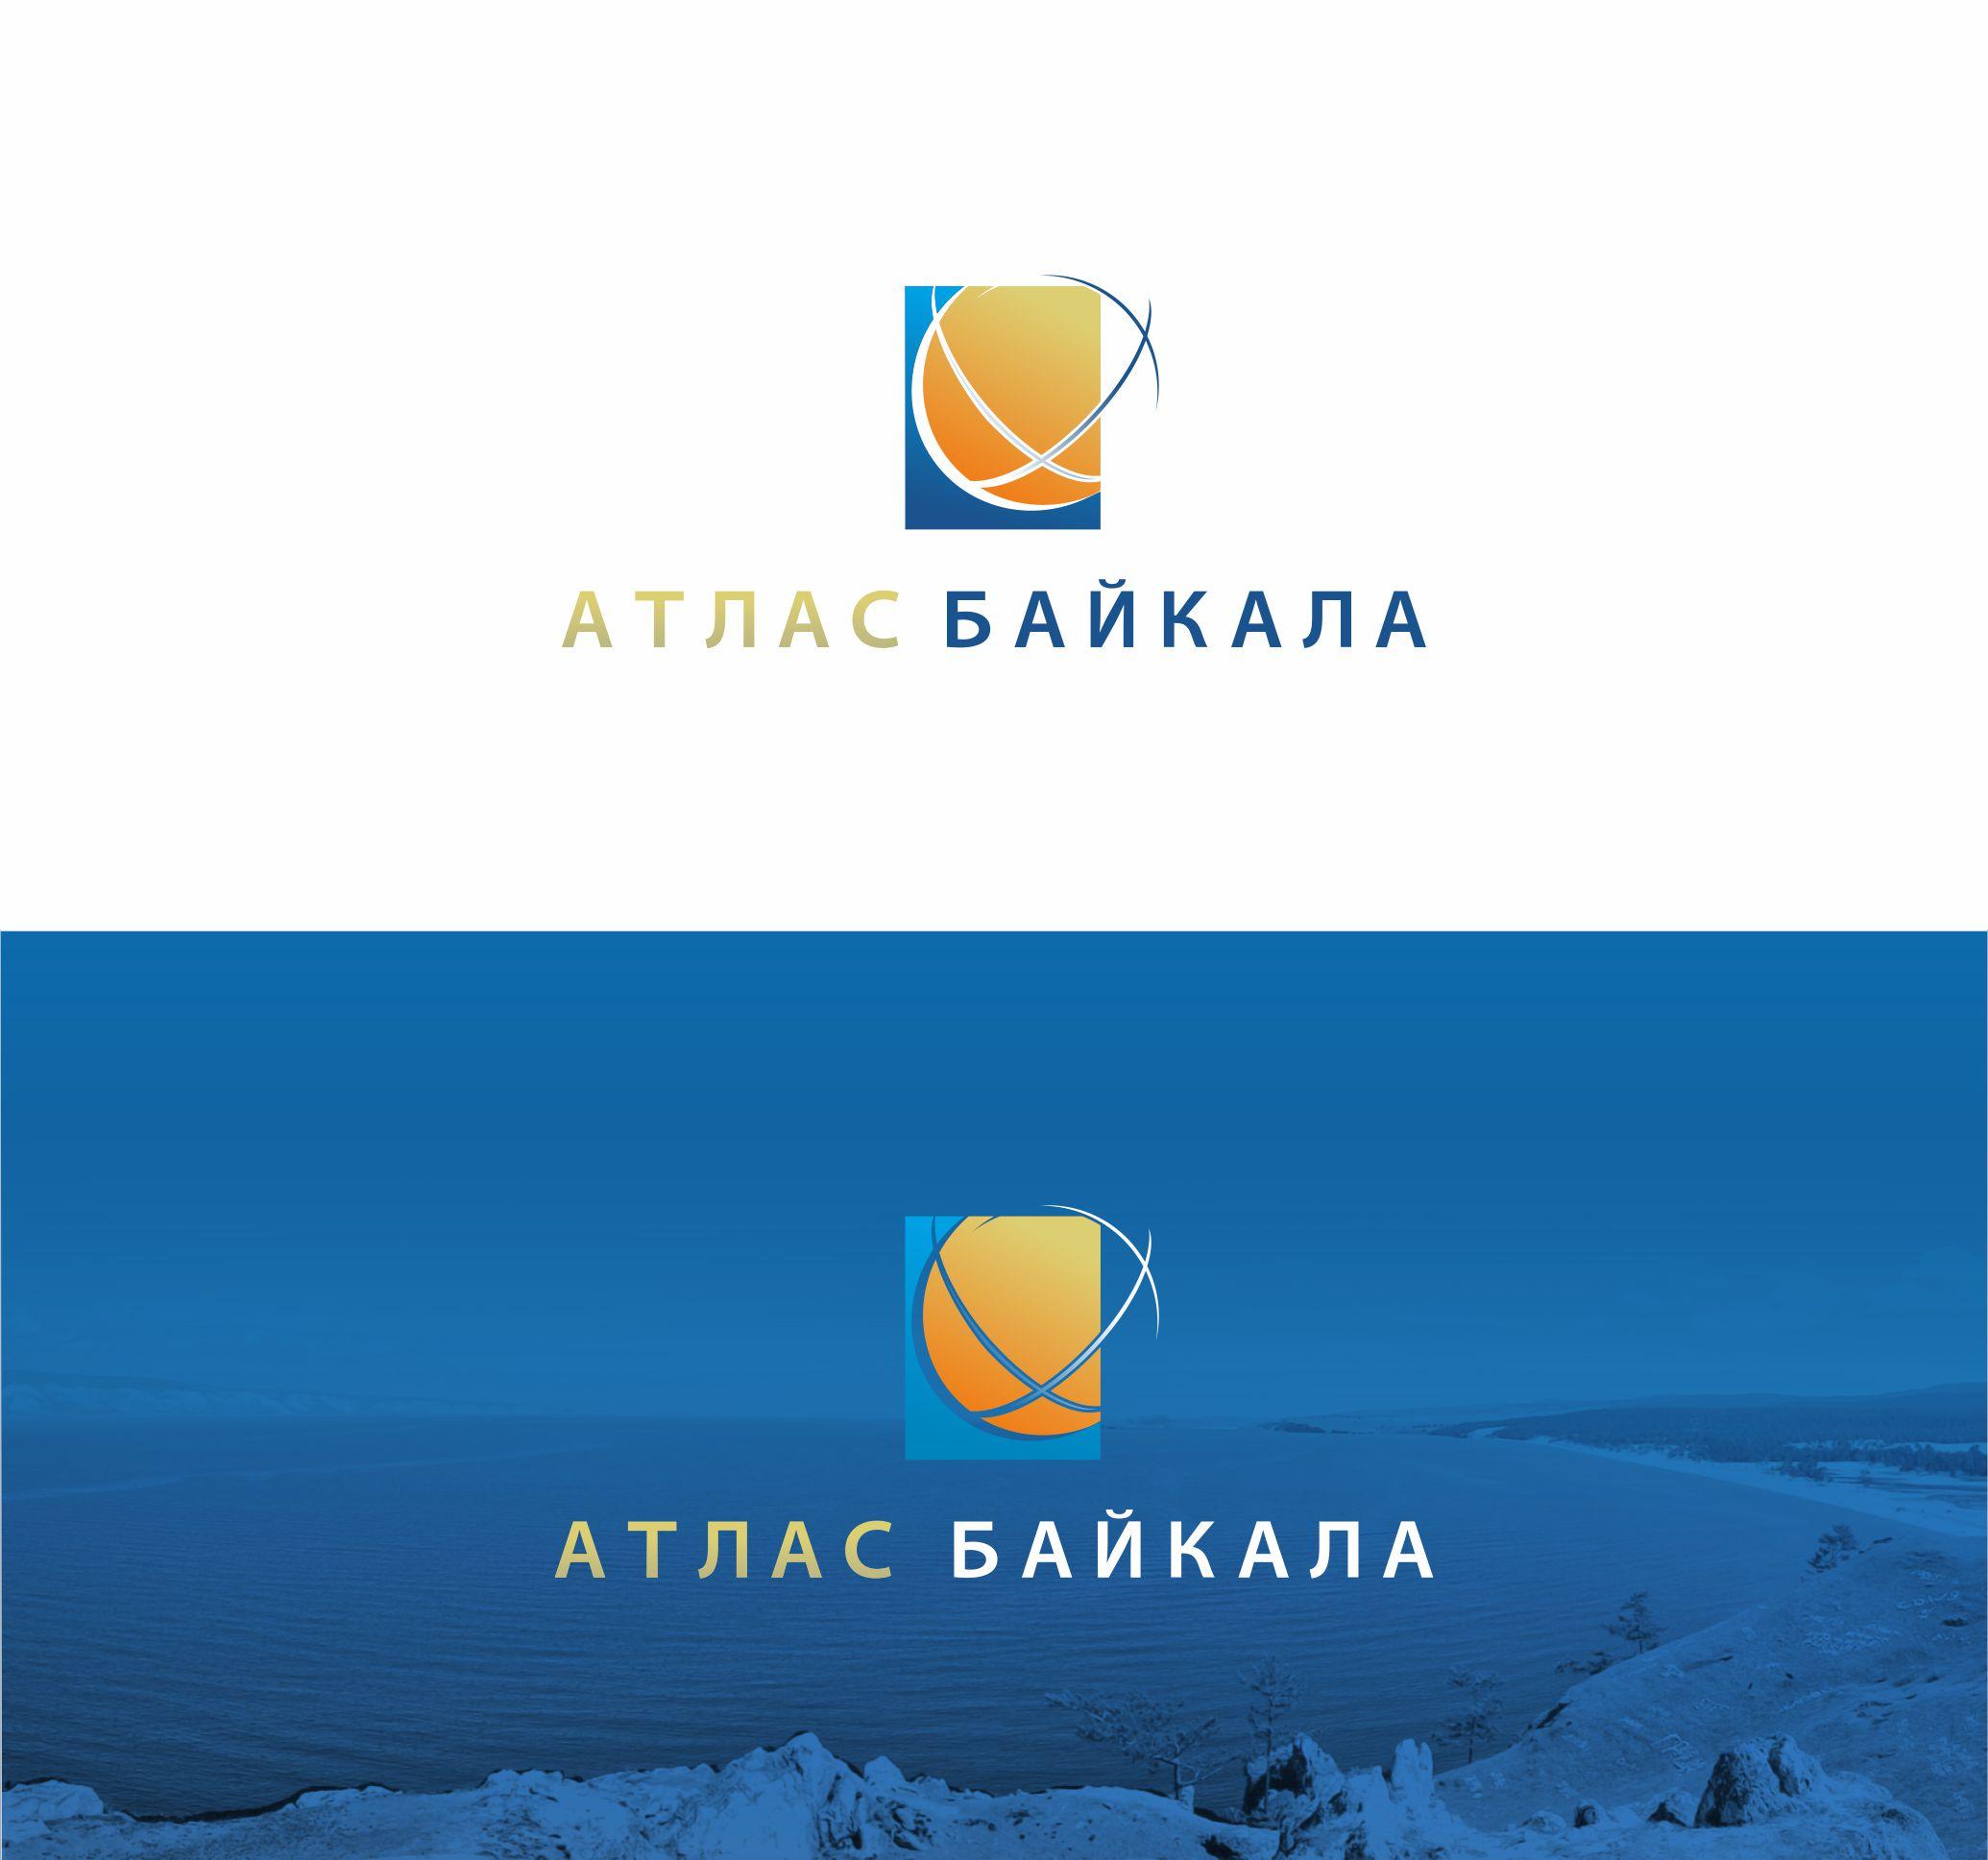 Разработка логотипа Атлас Байкала фото f_3285afc8e339aae1.jpg